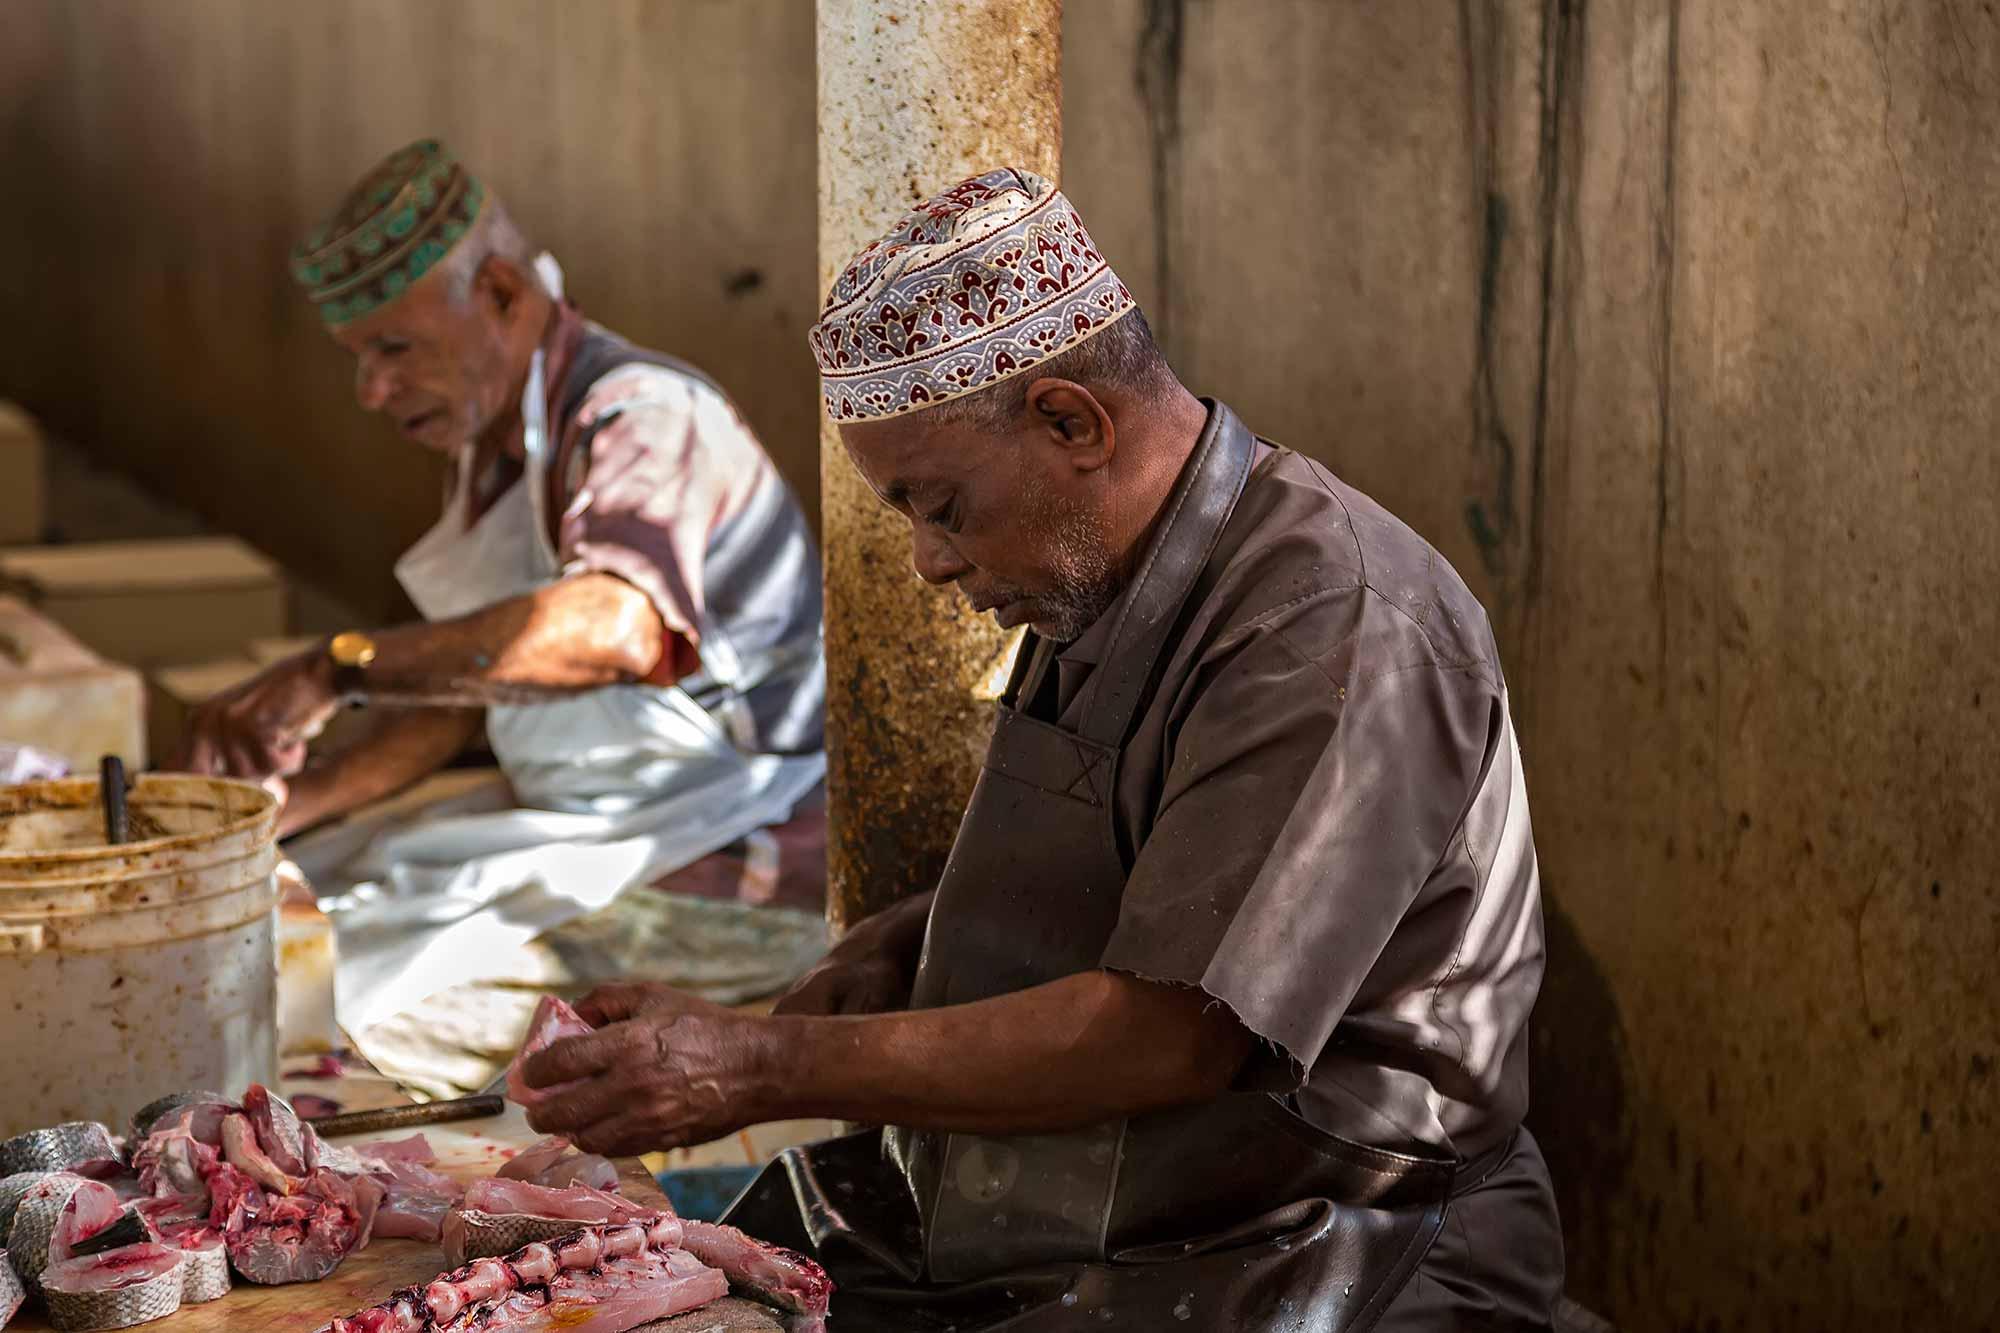 Fish market in Muscat, Oman. © Ulli Maier & Nisa Maier